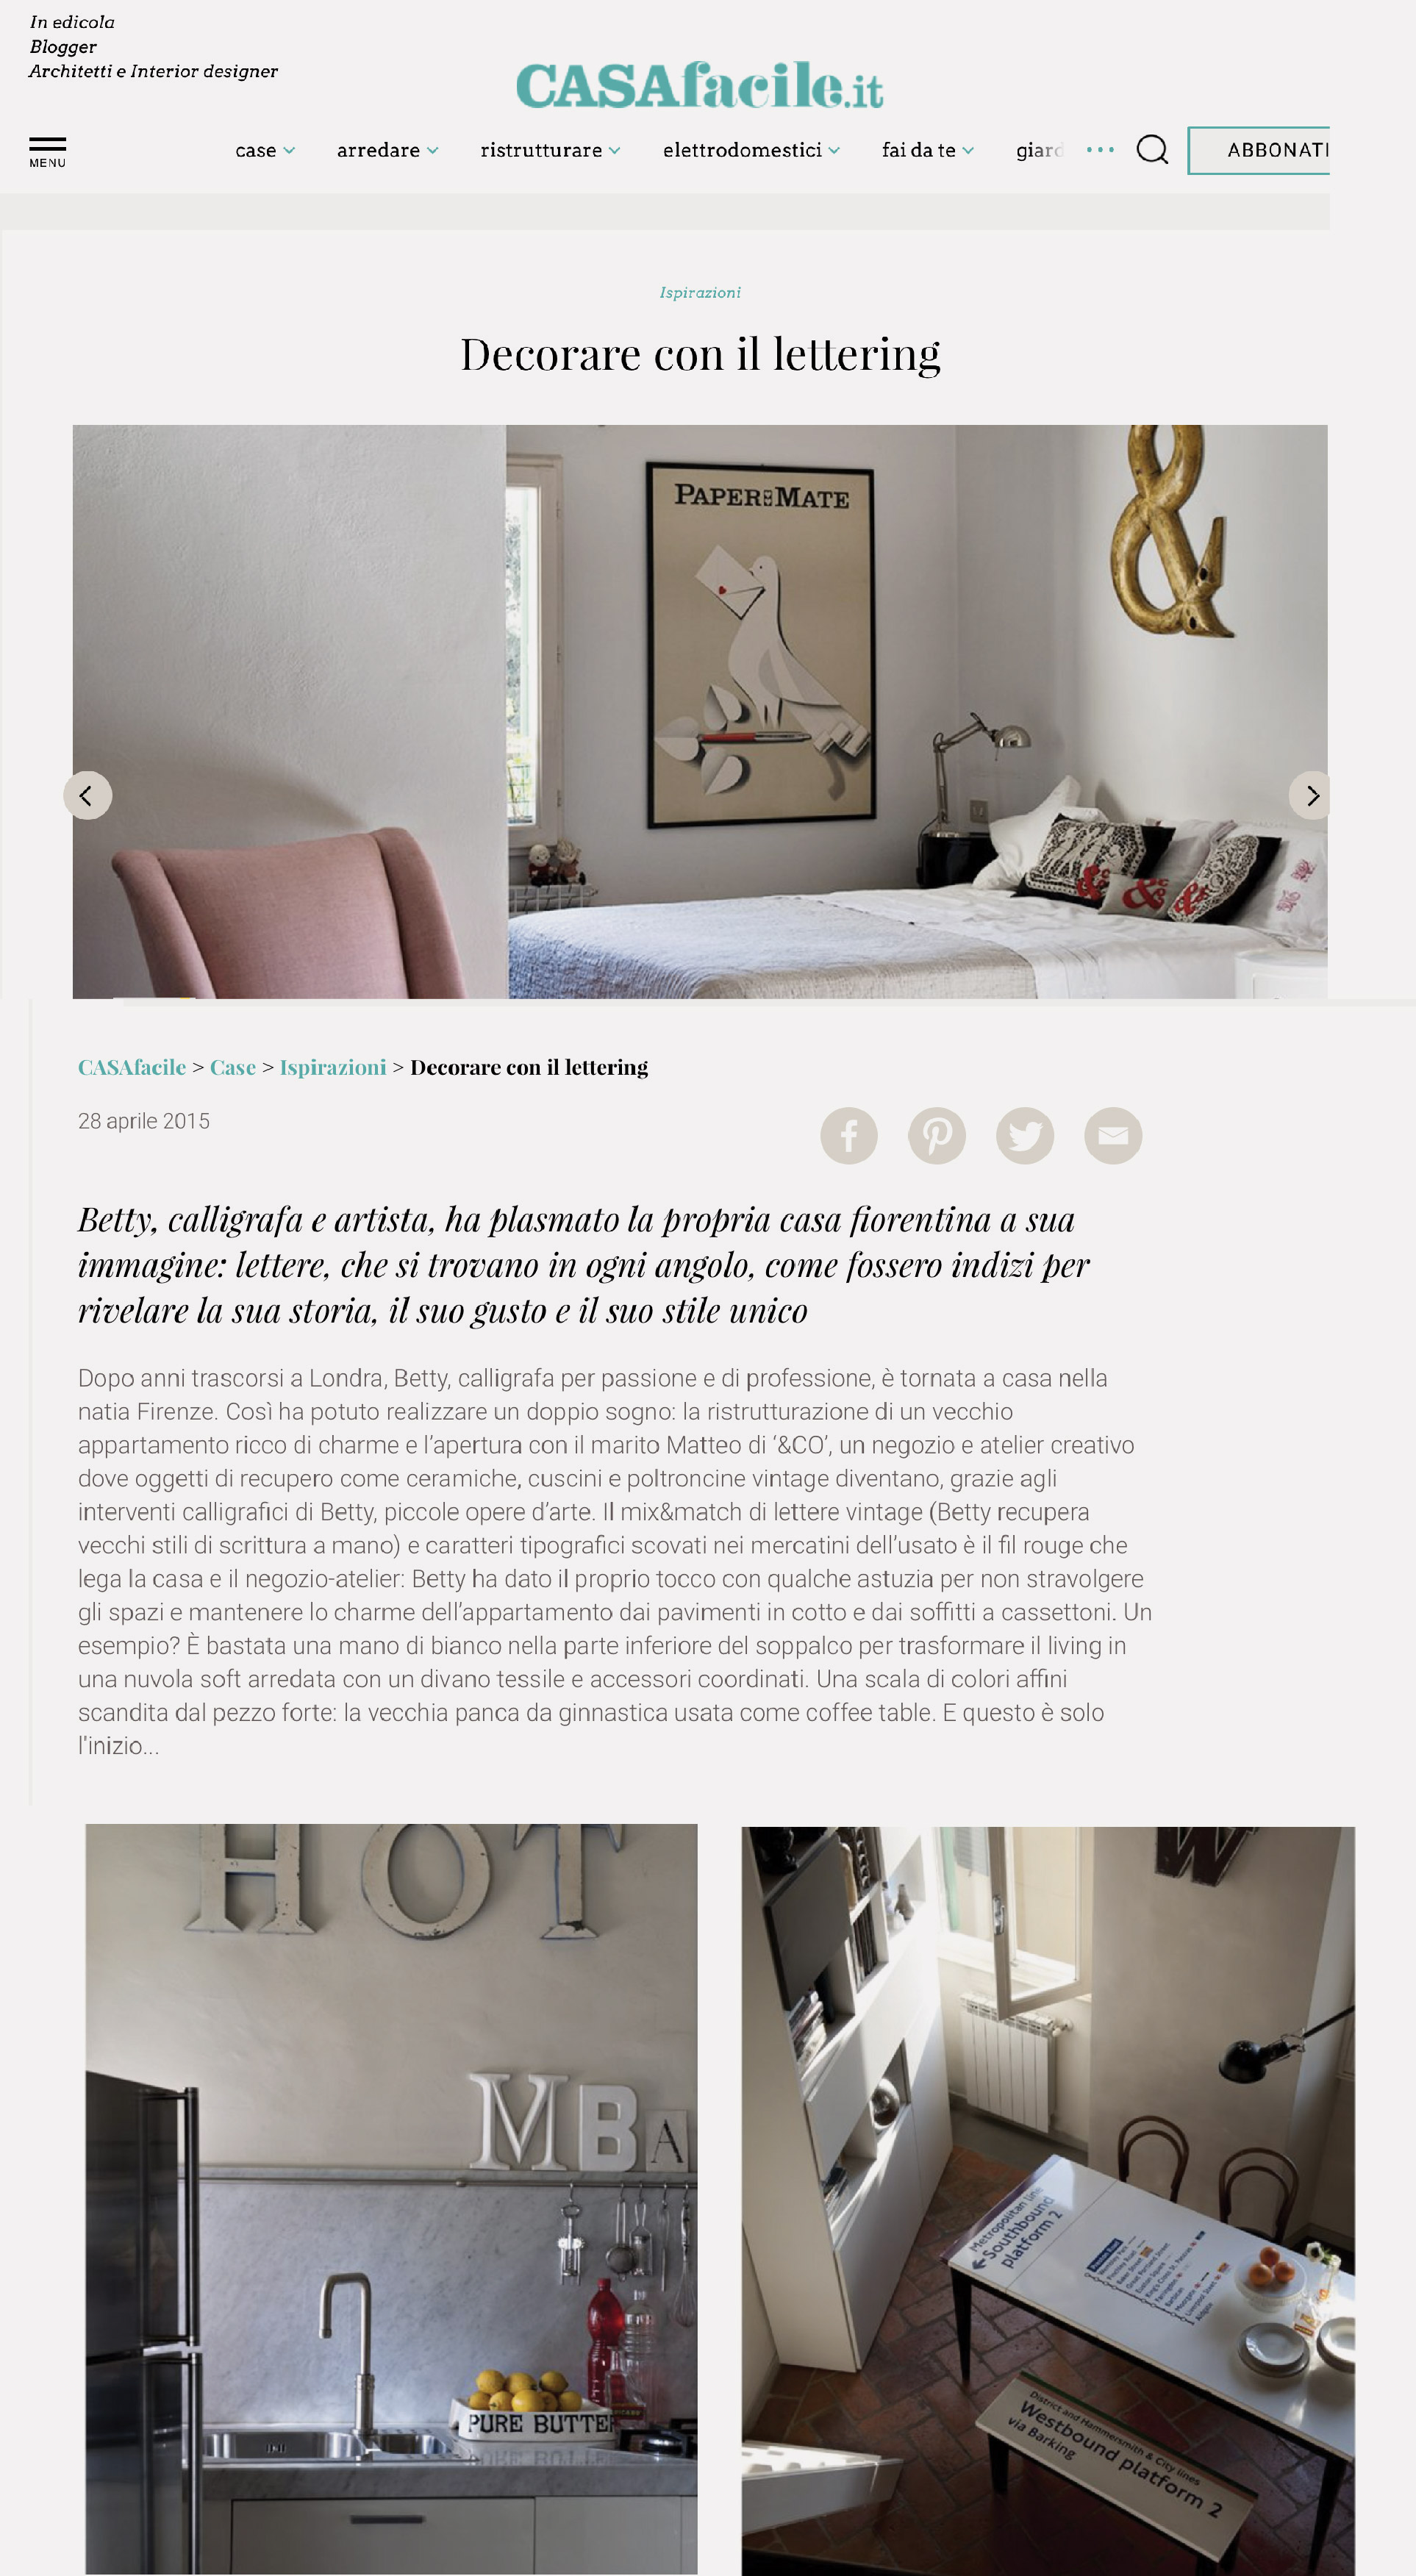 casafacile.it_web.jpg